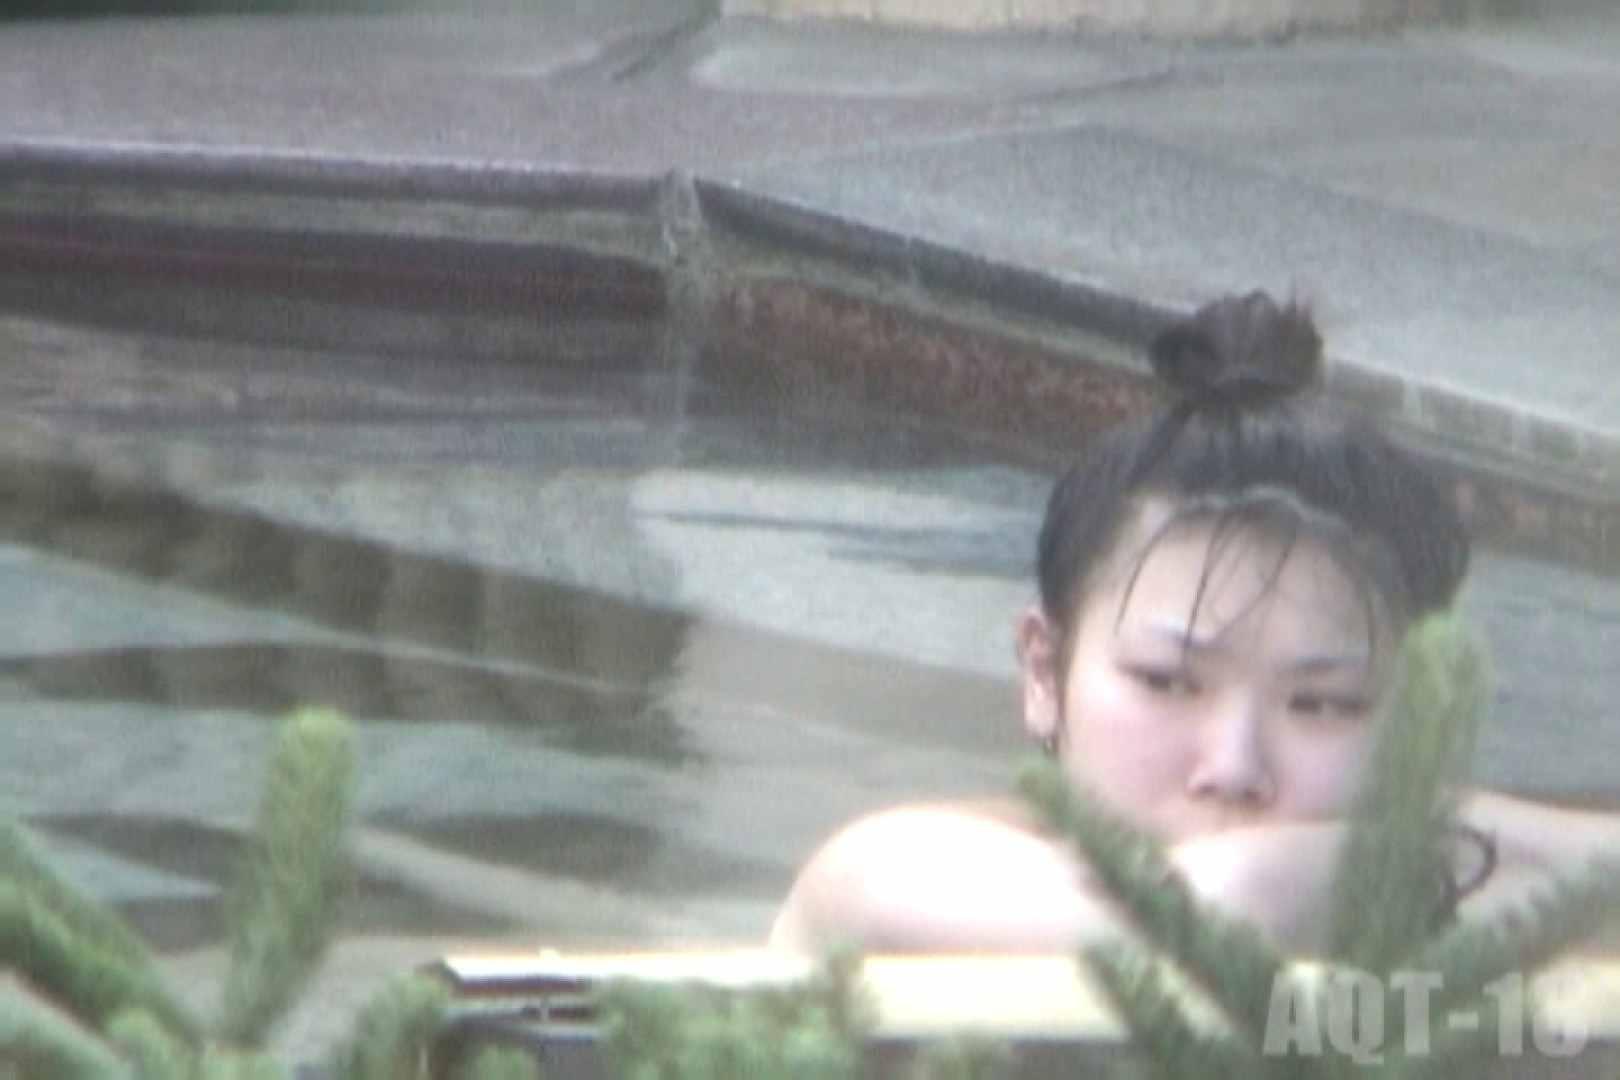 Aquaな露天風呂Vol.855 露天 | OLセックス  67画像 61